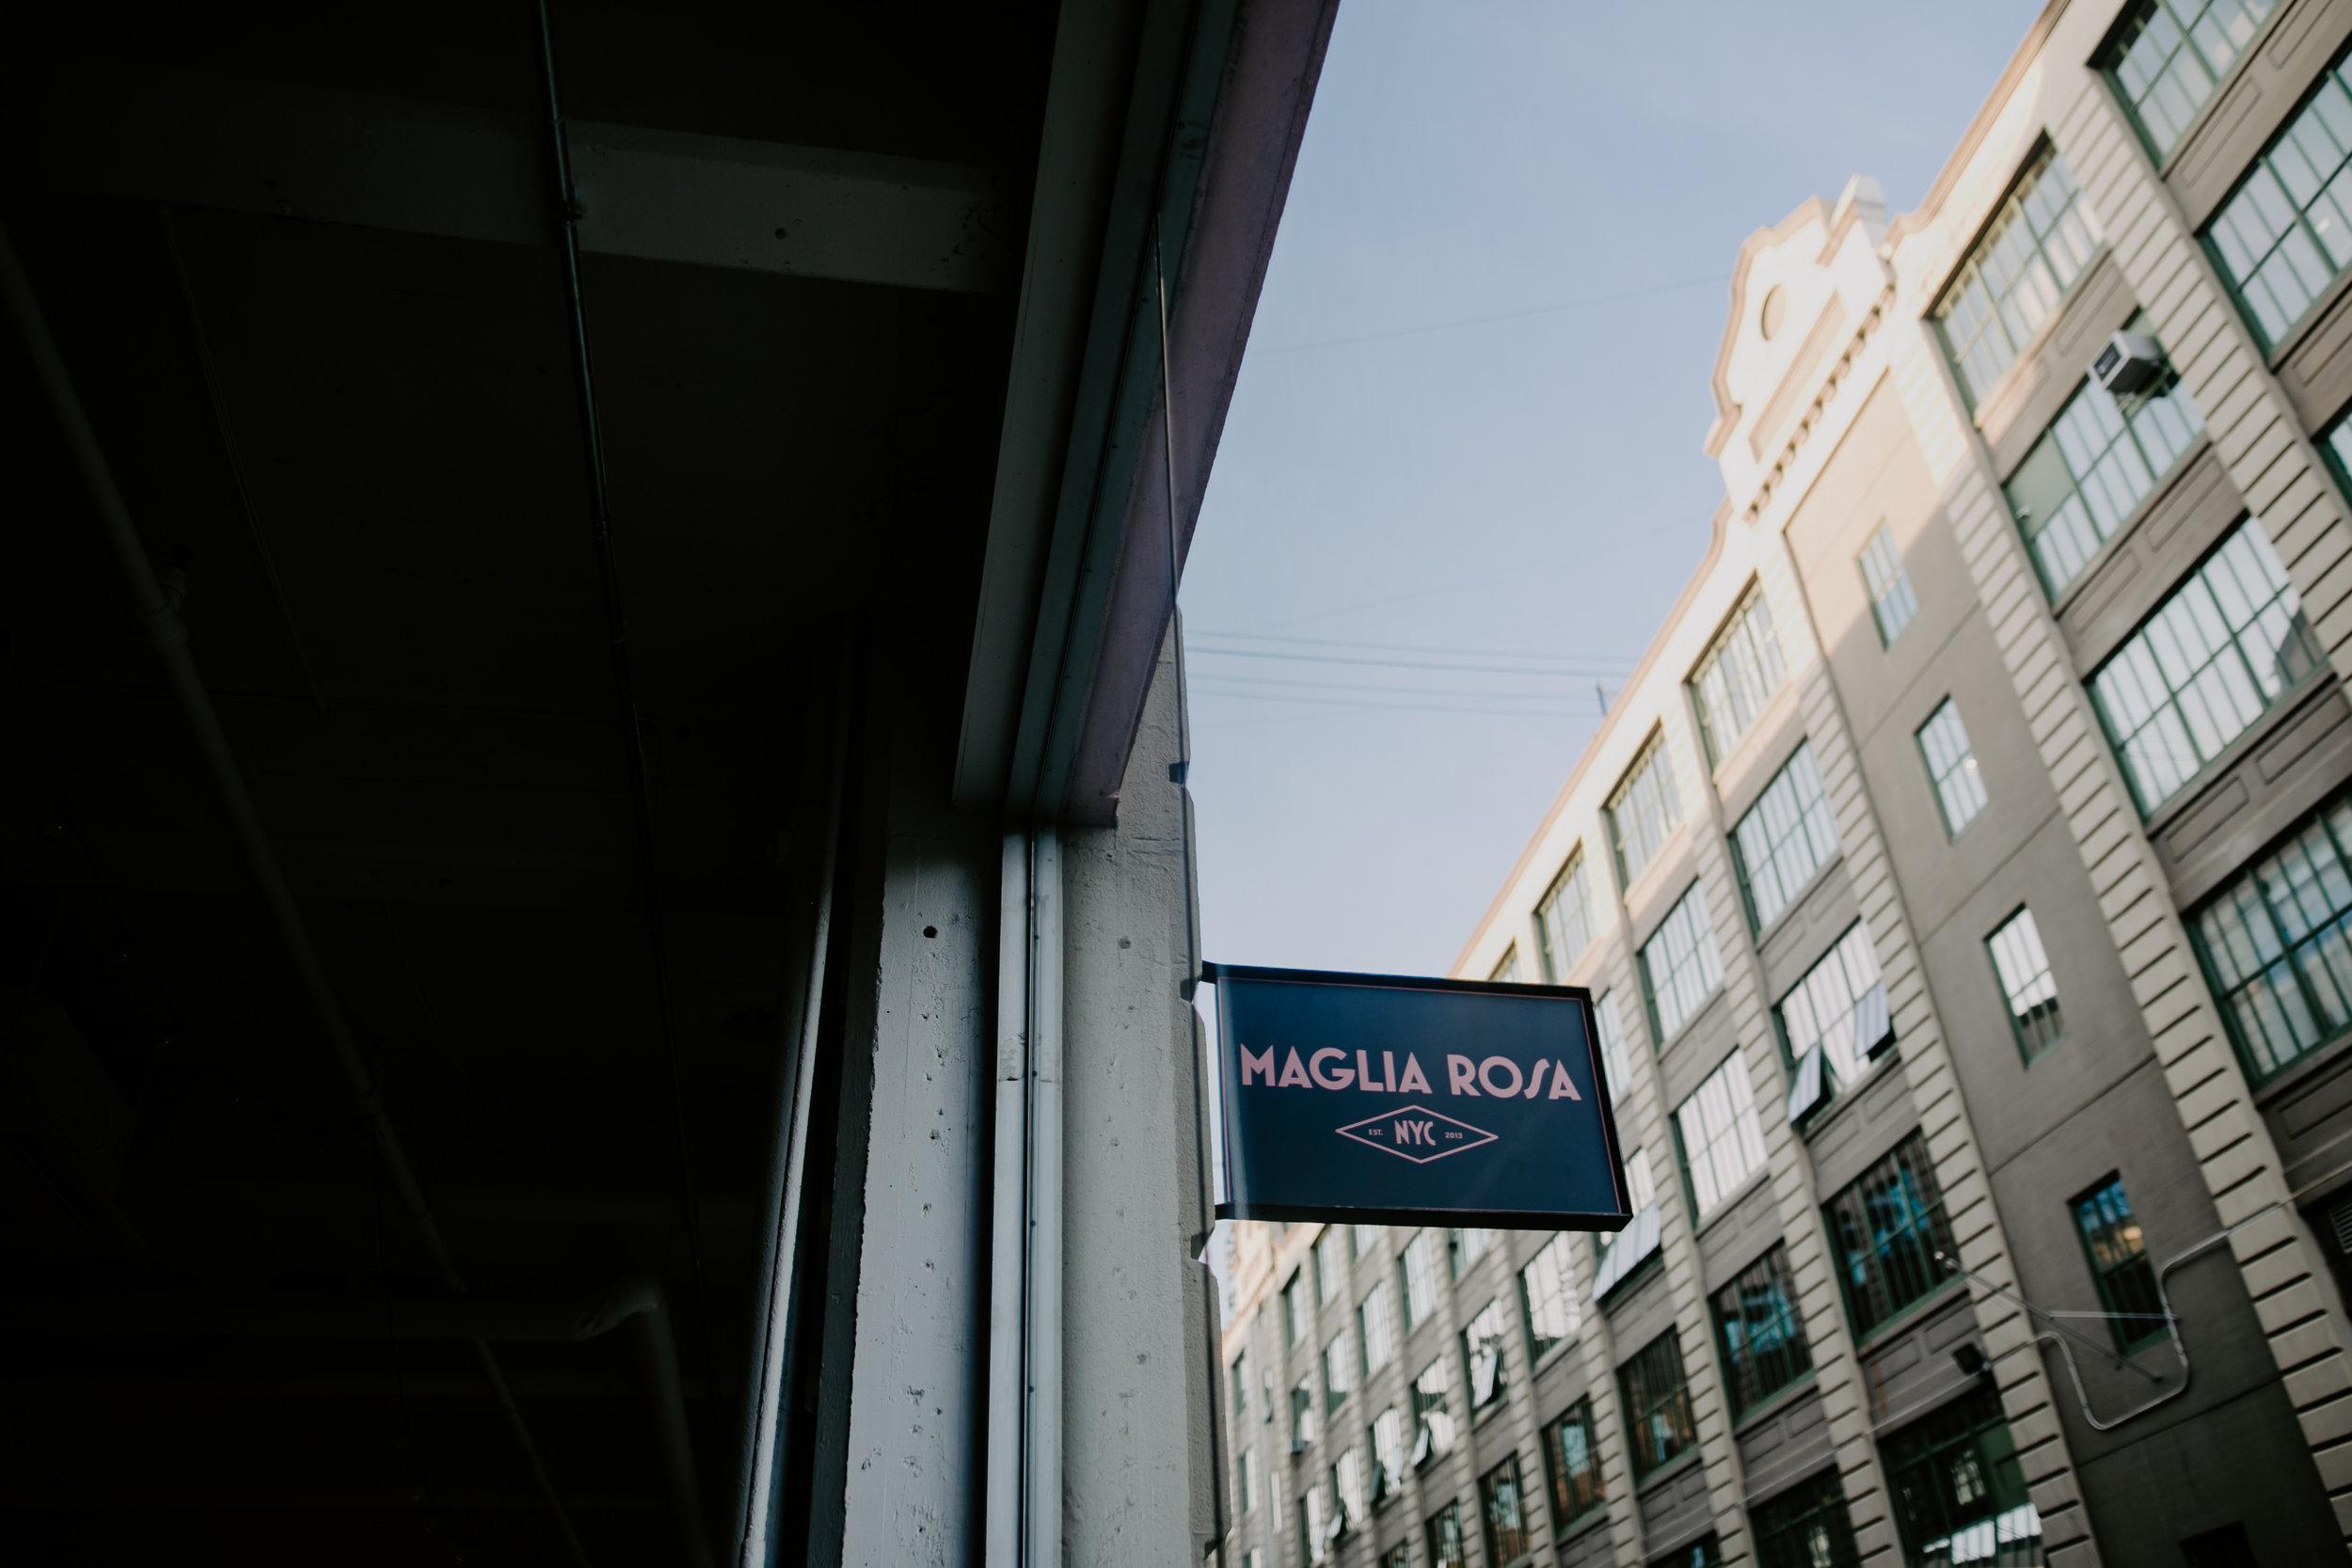 MagliaRose_BushTerminalPark_NYC_SusanAlex_Engagement-22.jpg